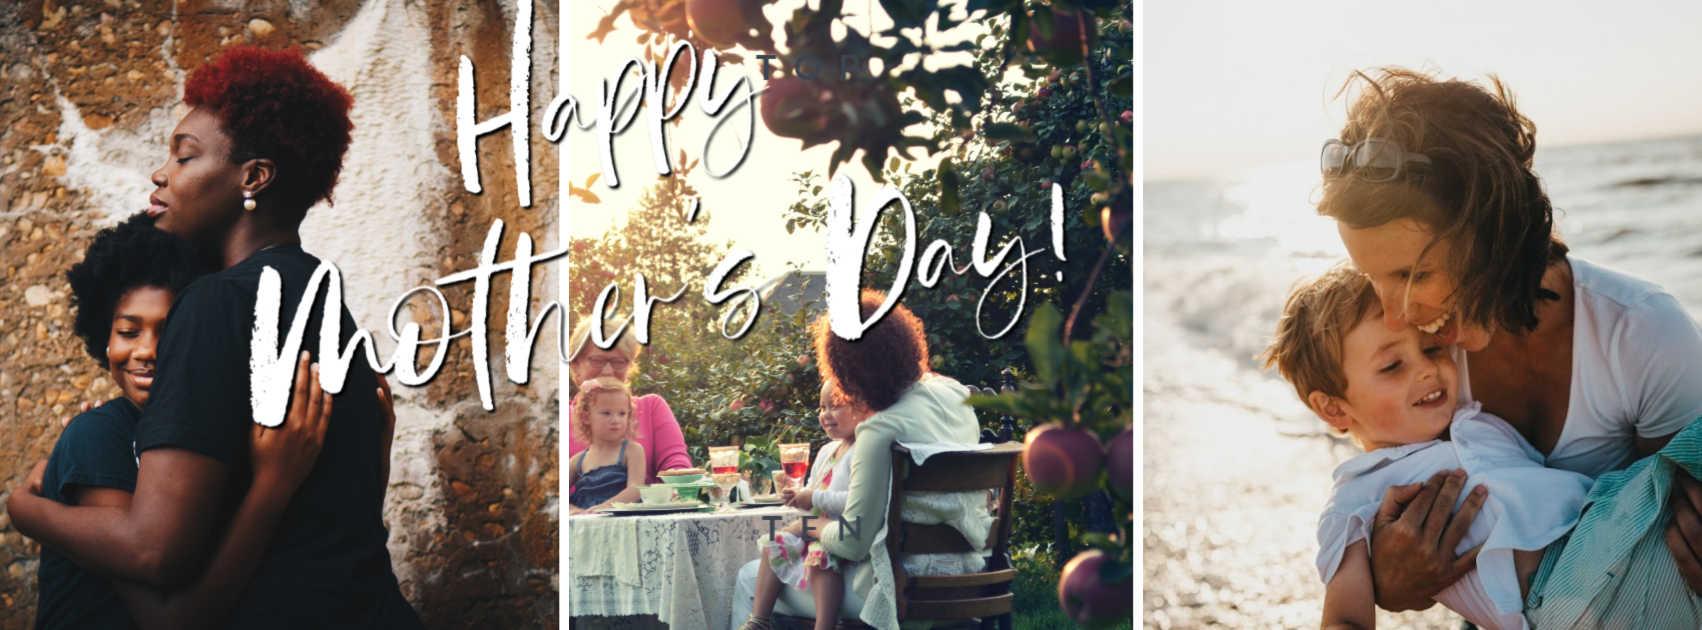 Mother's Day, Mother's Day gift ideas, Mother's Day 2020